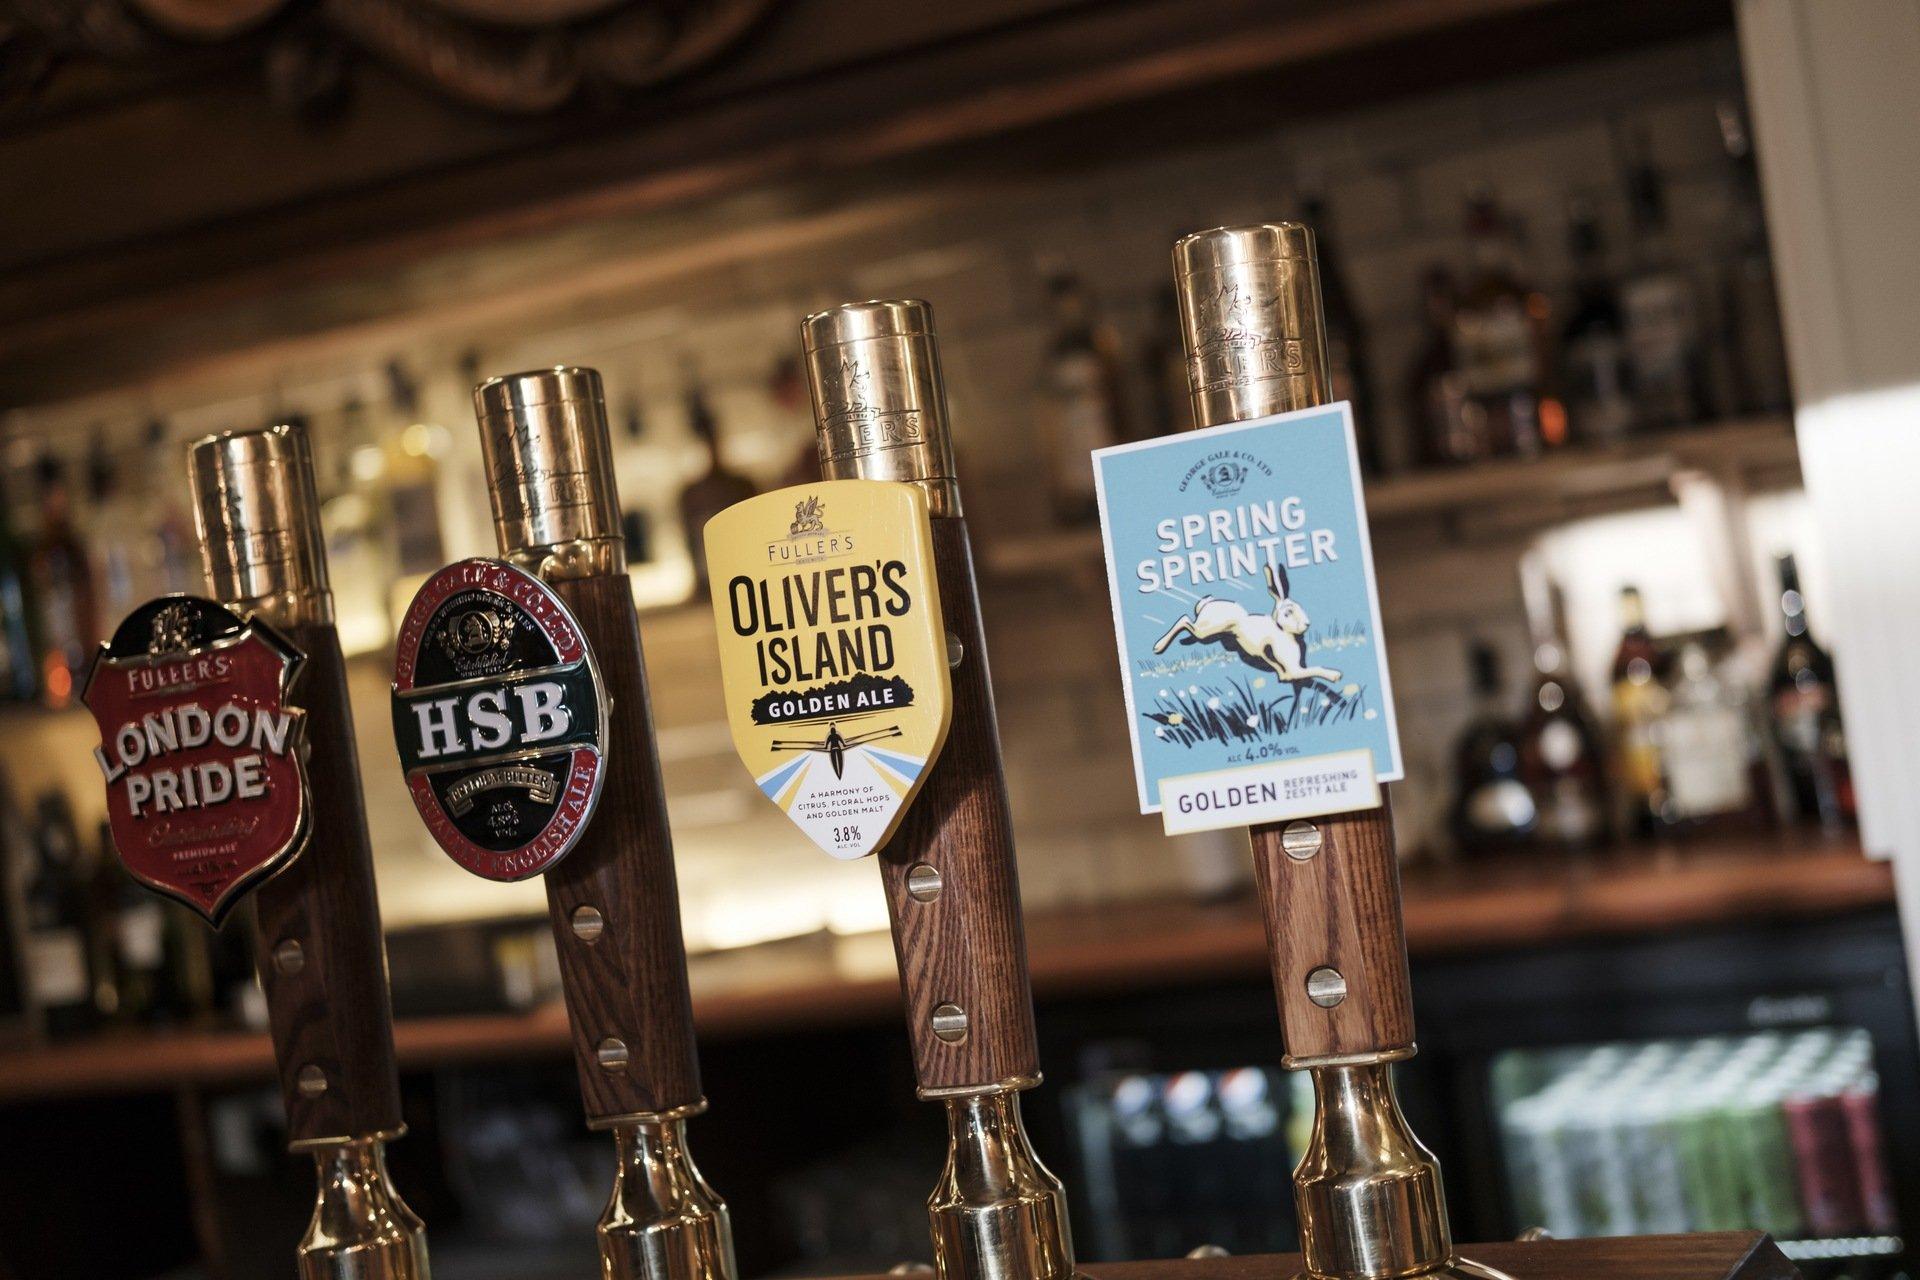 The Head of the River Restaurant, Pub & Bar Oxford - Bar